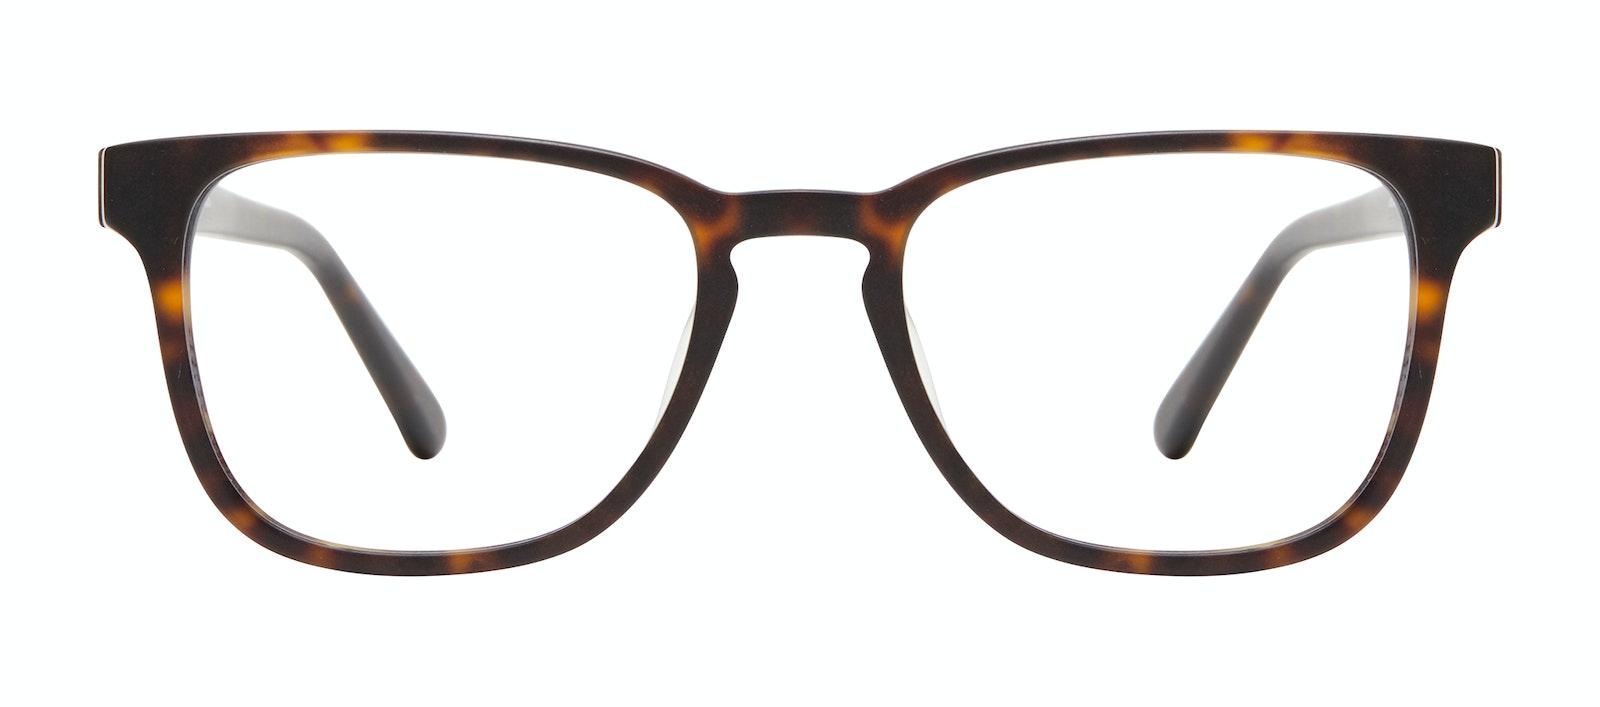 Affordable Fashion Glasses Square Eyeglasses Men Kim XL Matte Tortoise Front